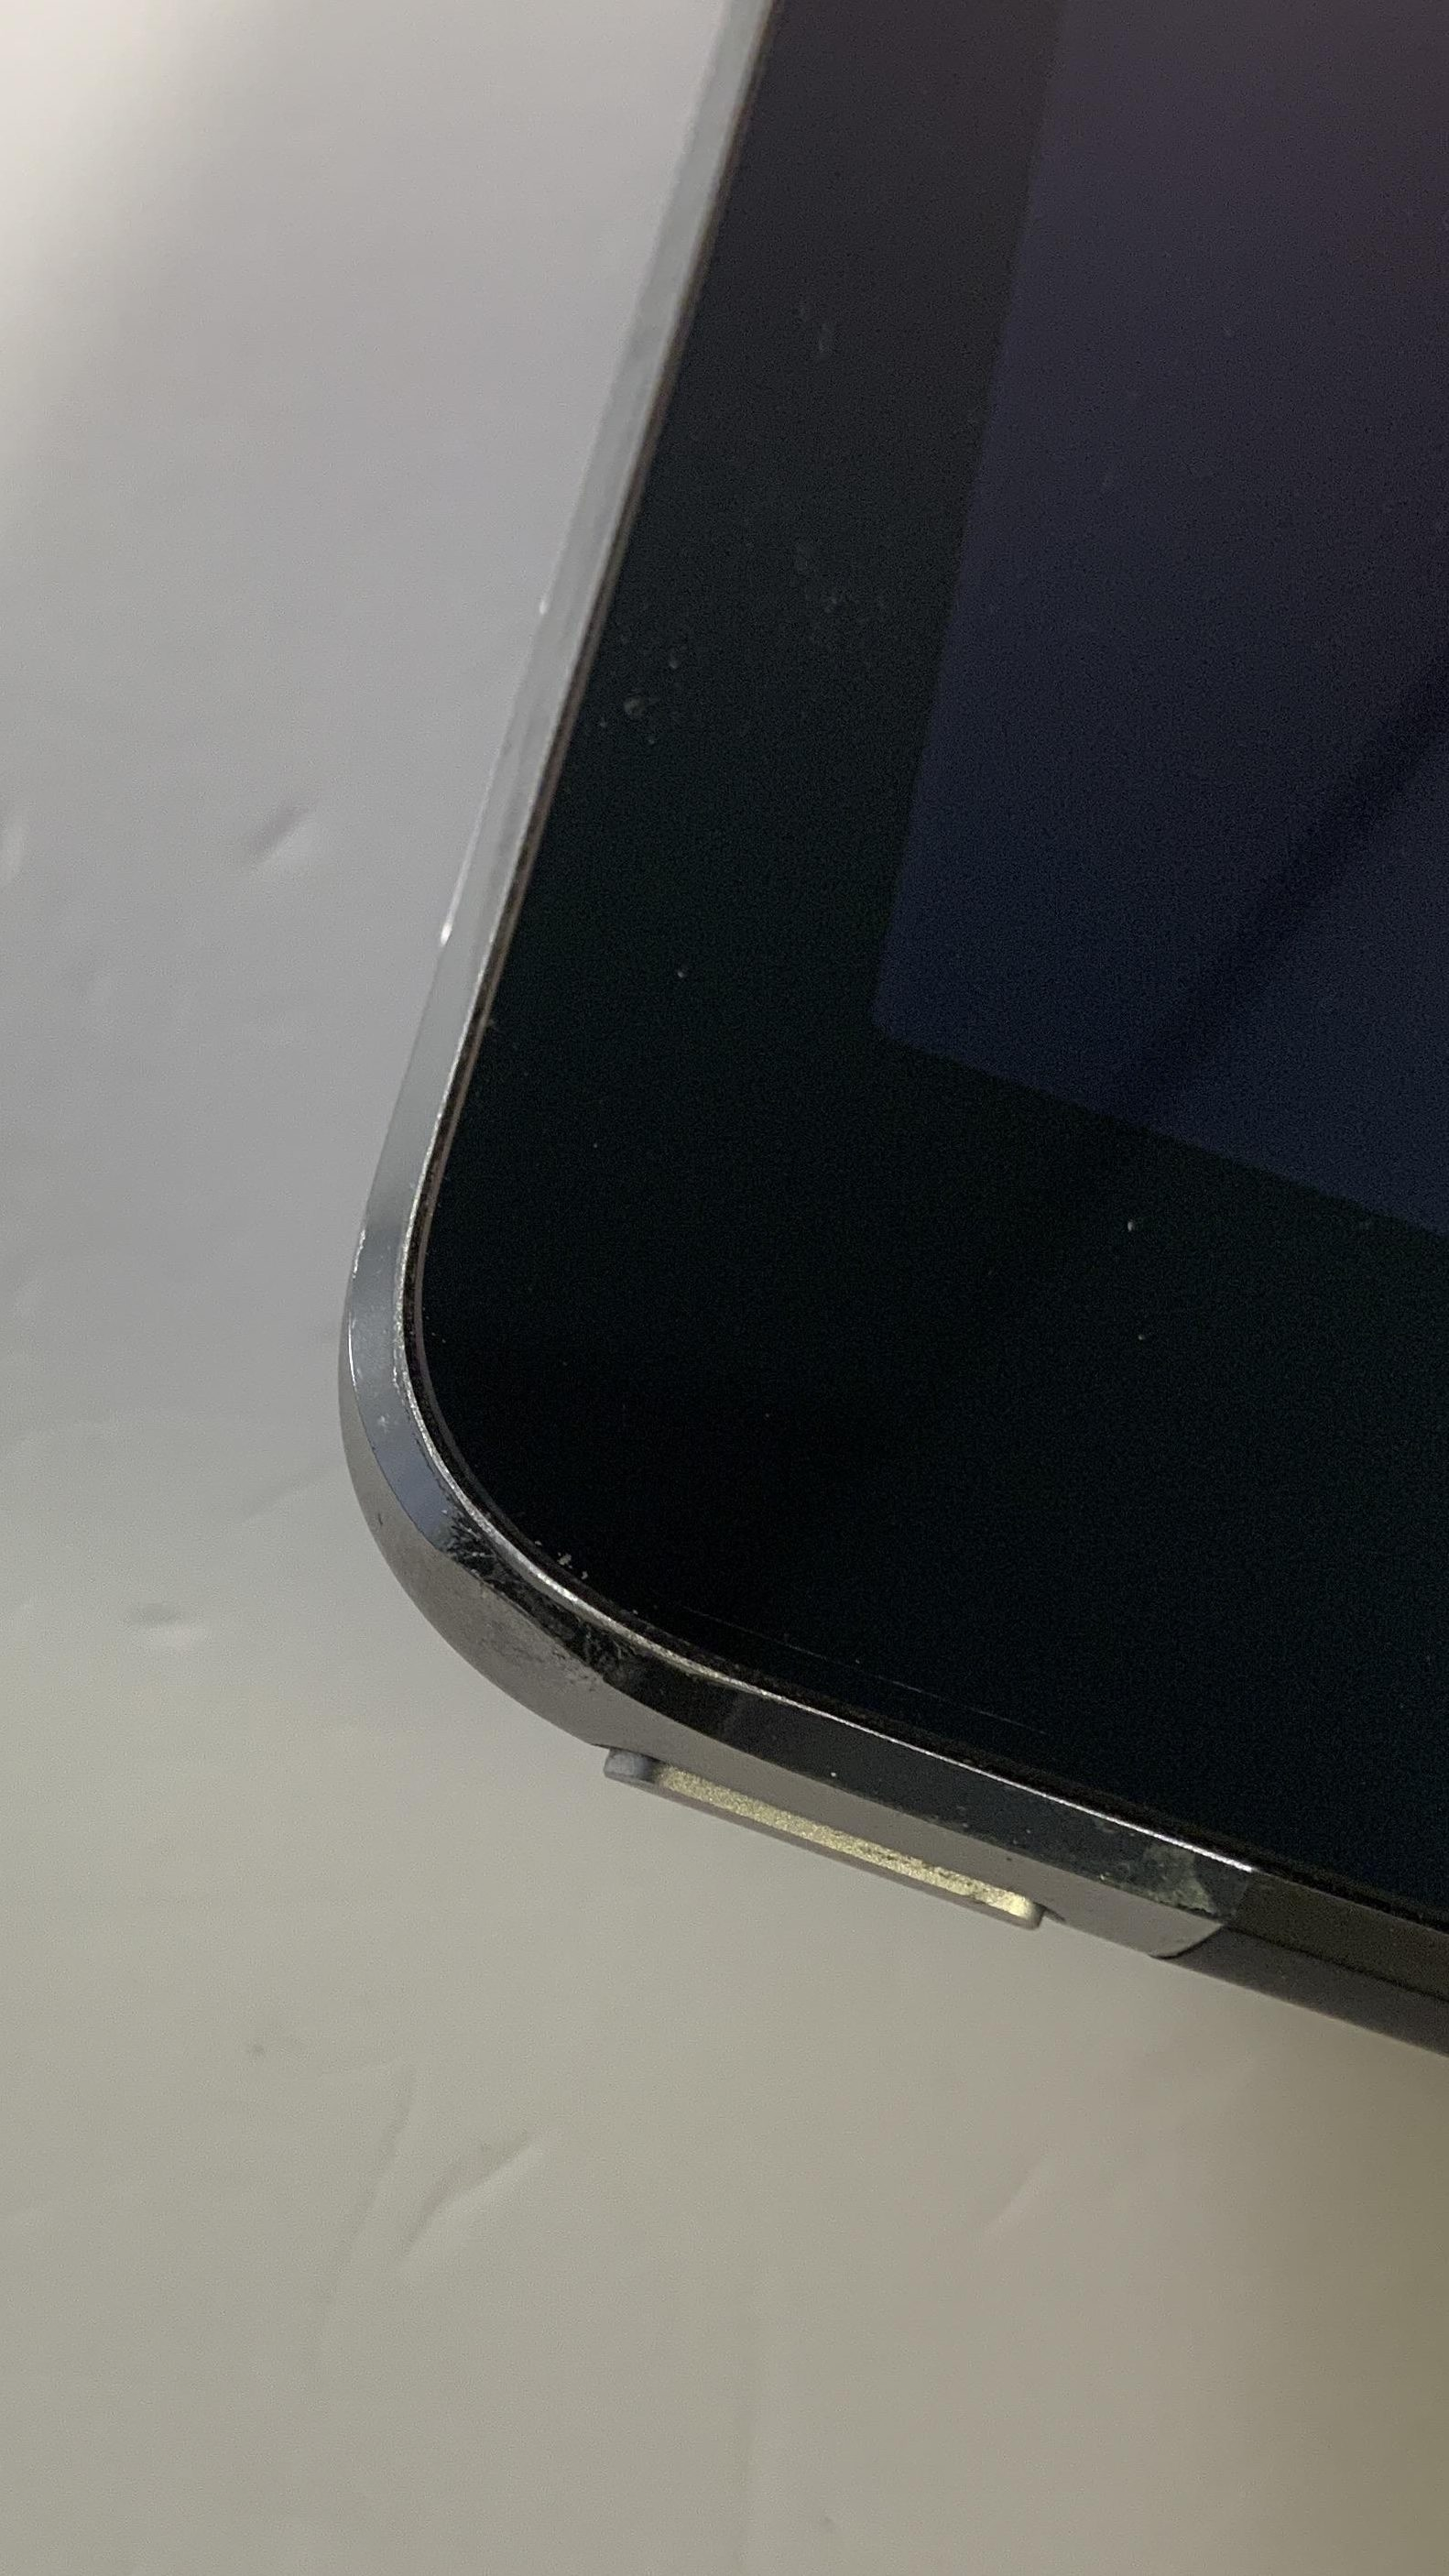 iPad Air 2 Wi-Fi + Cellular 64GB, 64GB, Space Gray, obraz 6